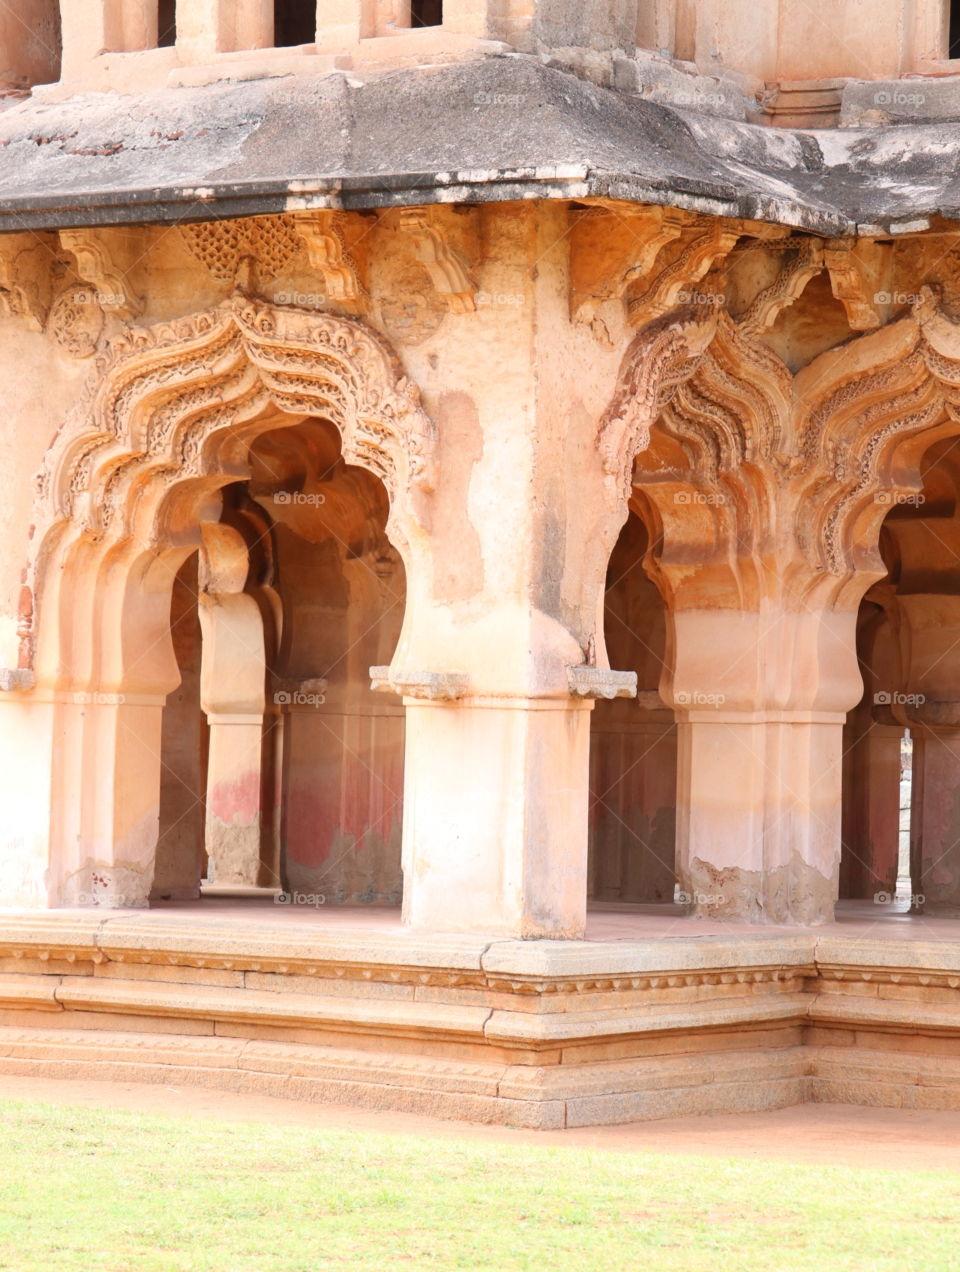 Architecture, Travel, Building, Stone, Ancient